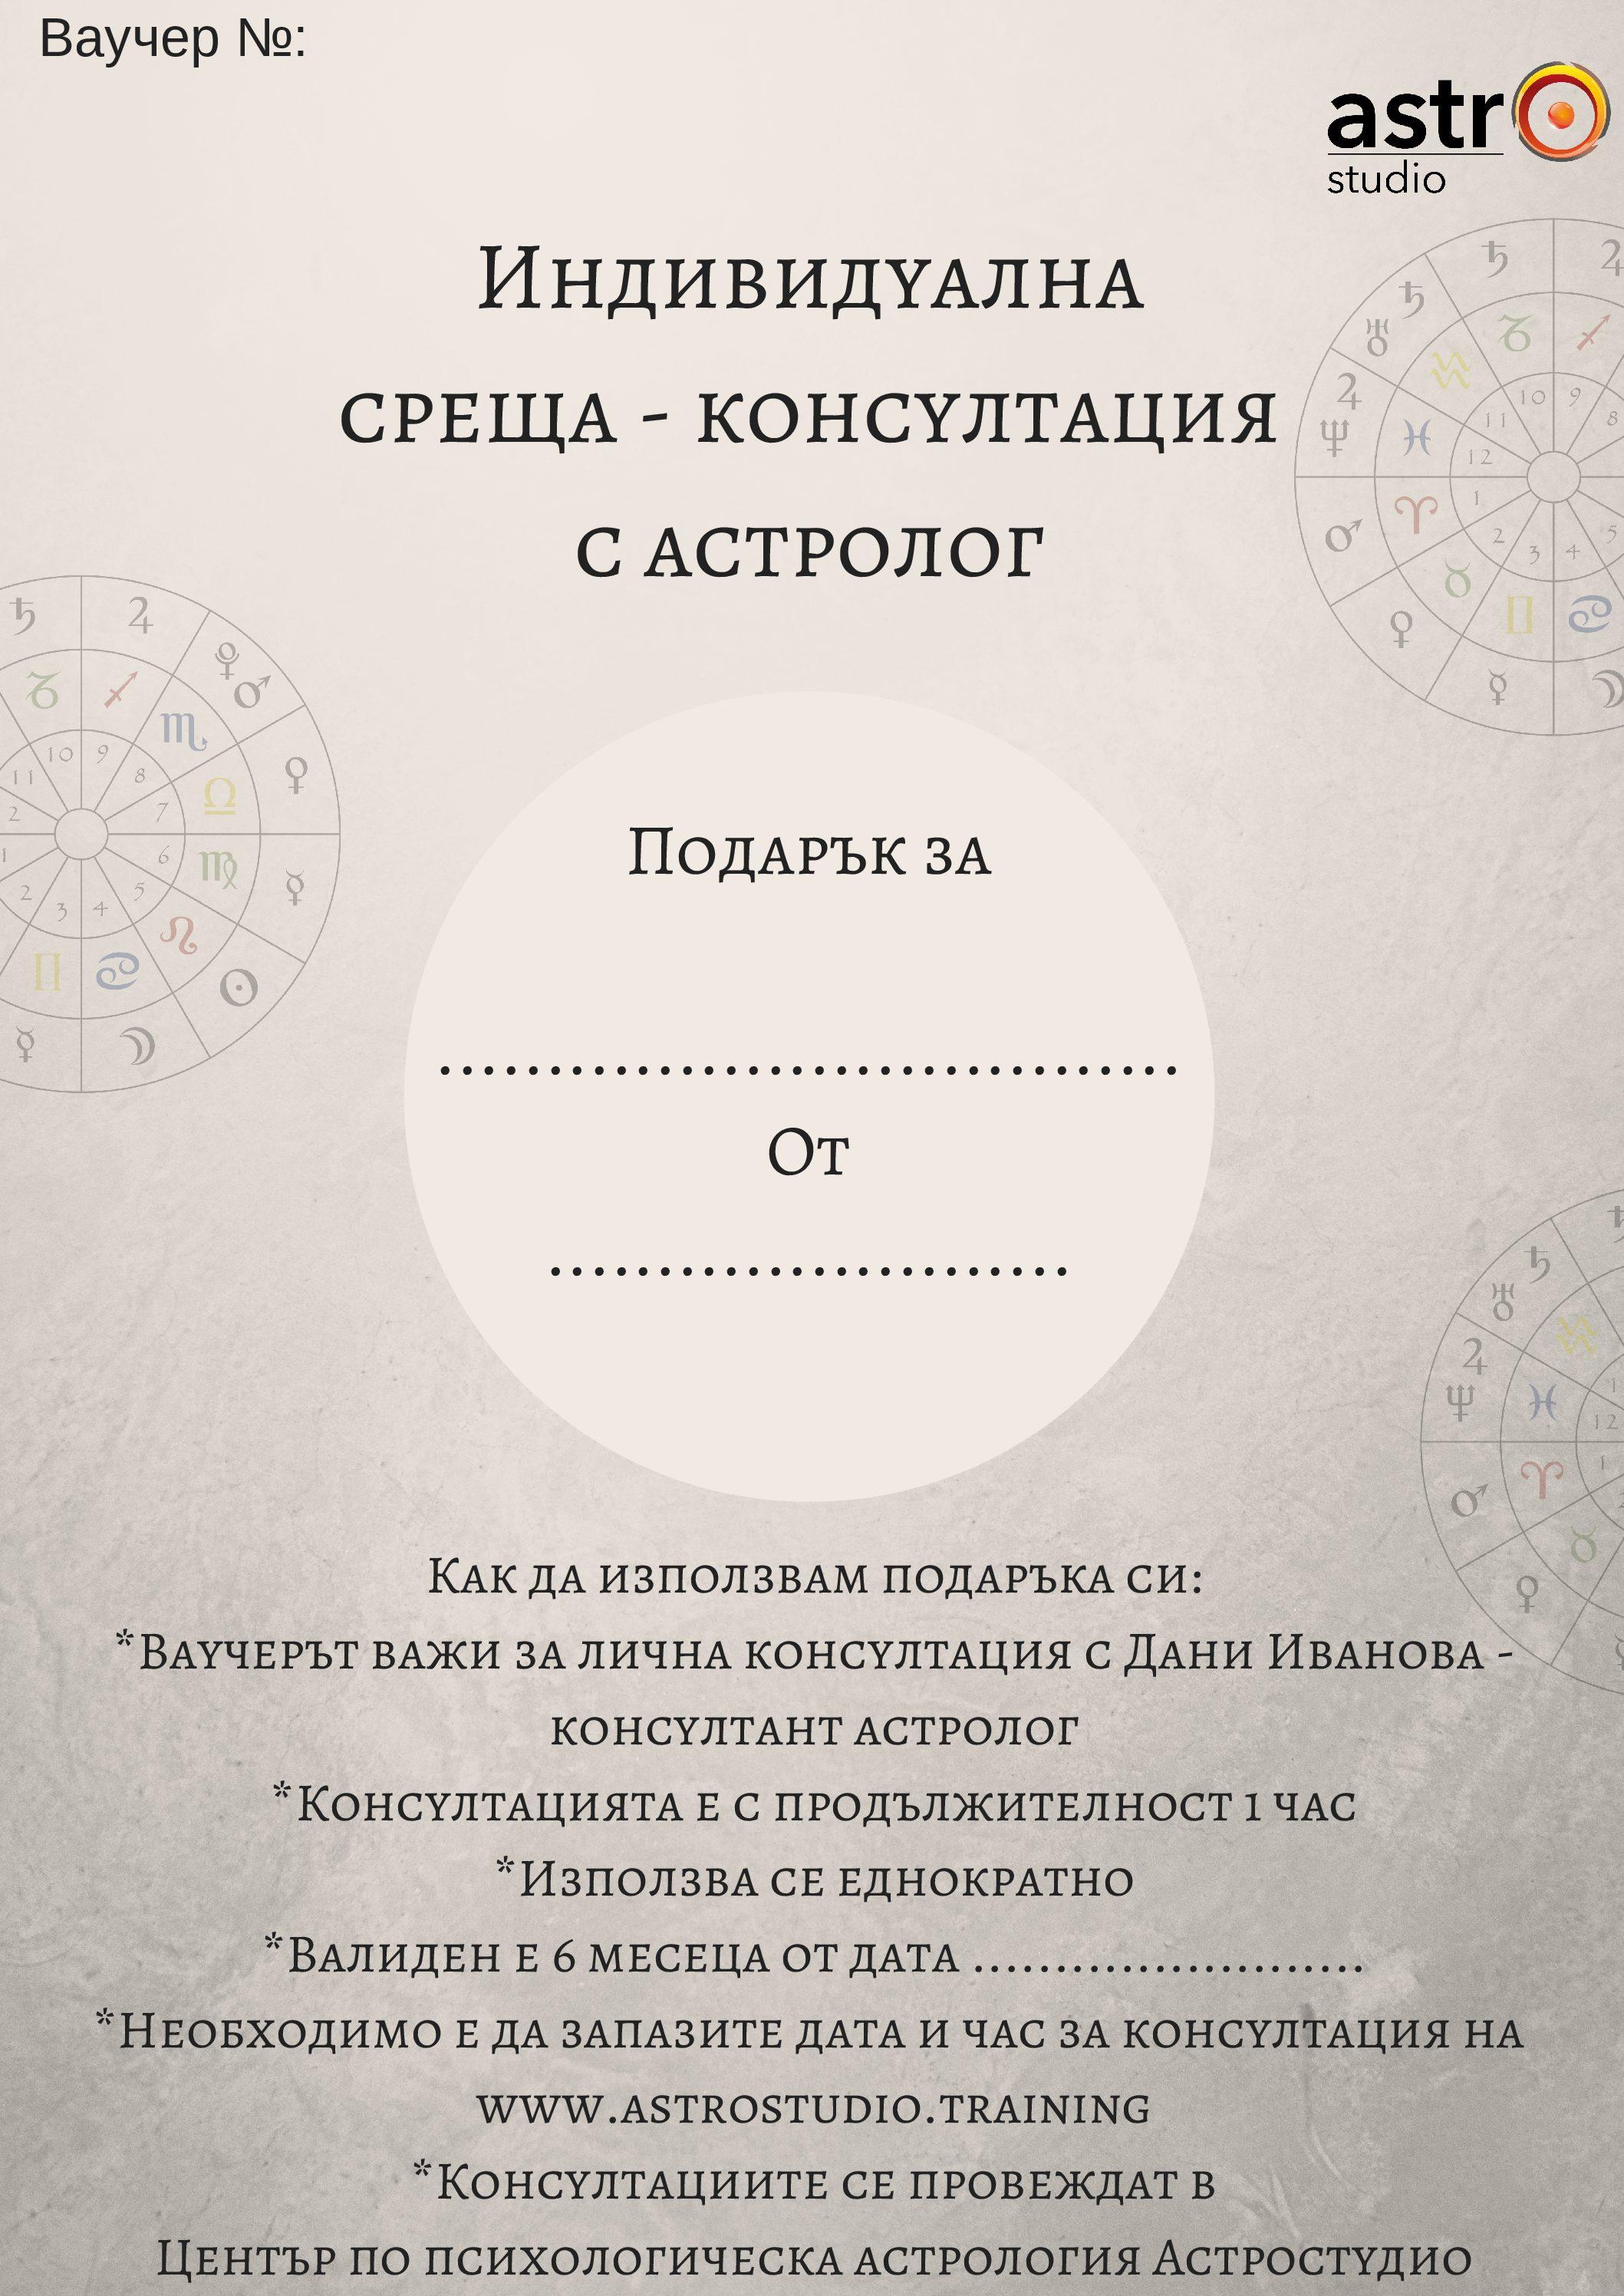 Консултация с астролог